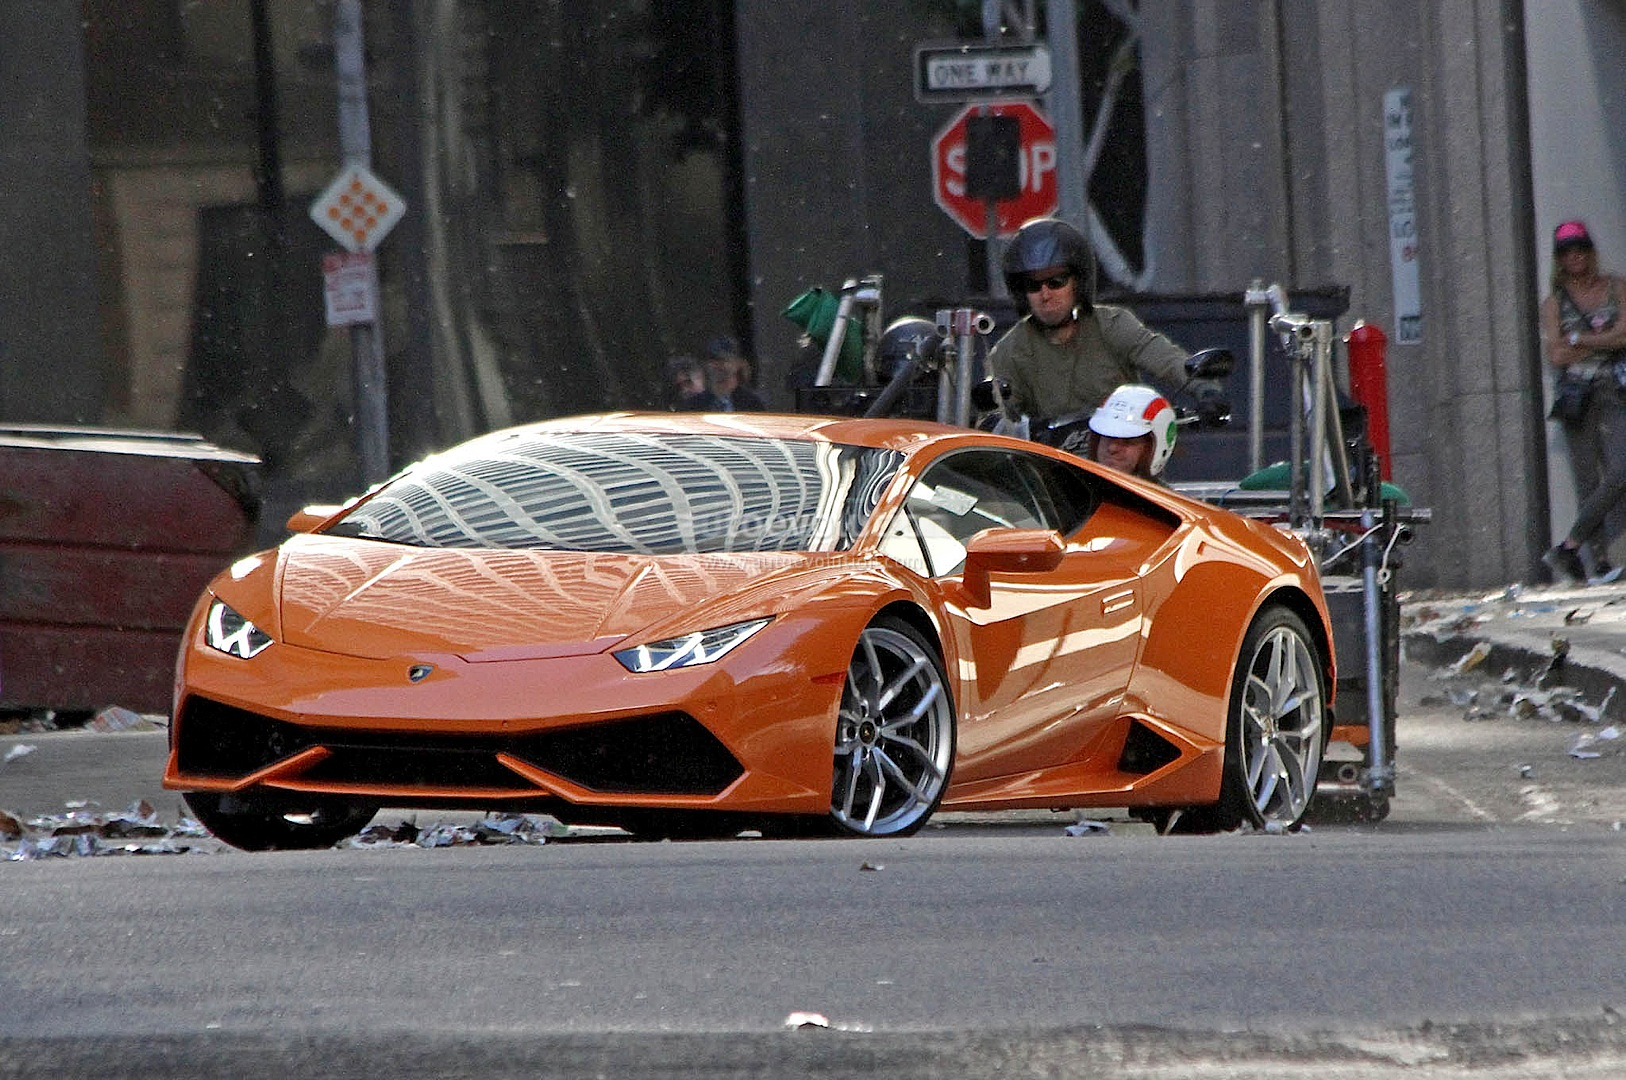 spyshots orange lamborghini huracan street racing in the us autoevolution - Lamborghini Huracan Orange Interior